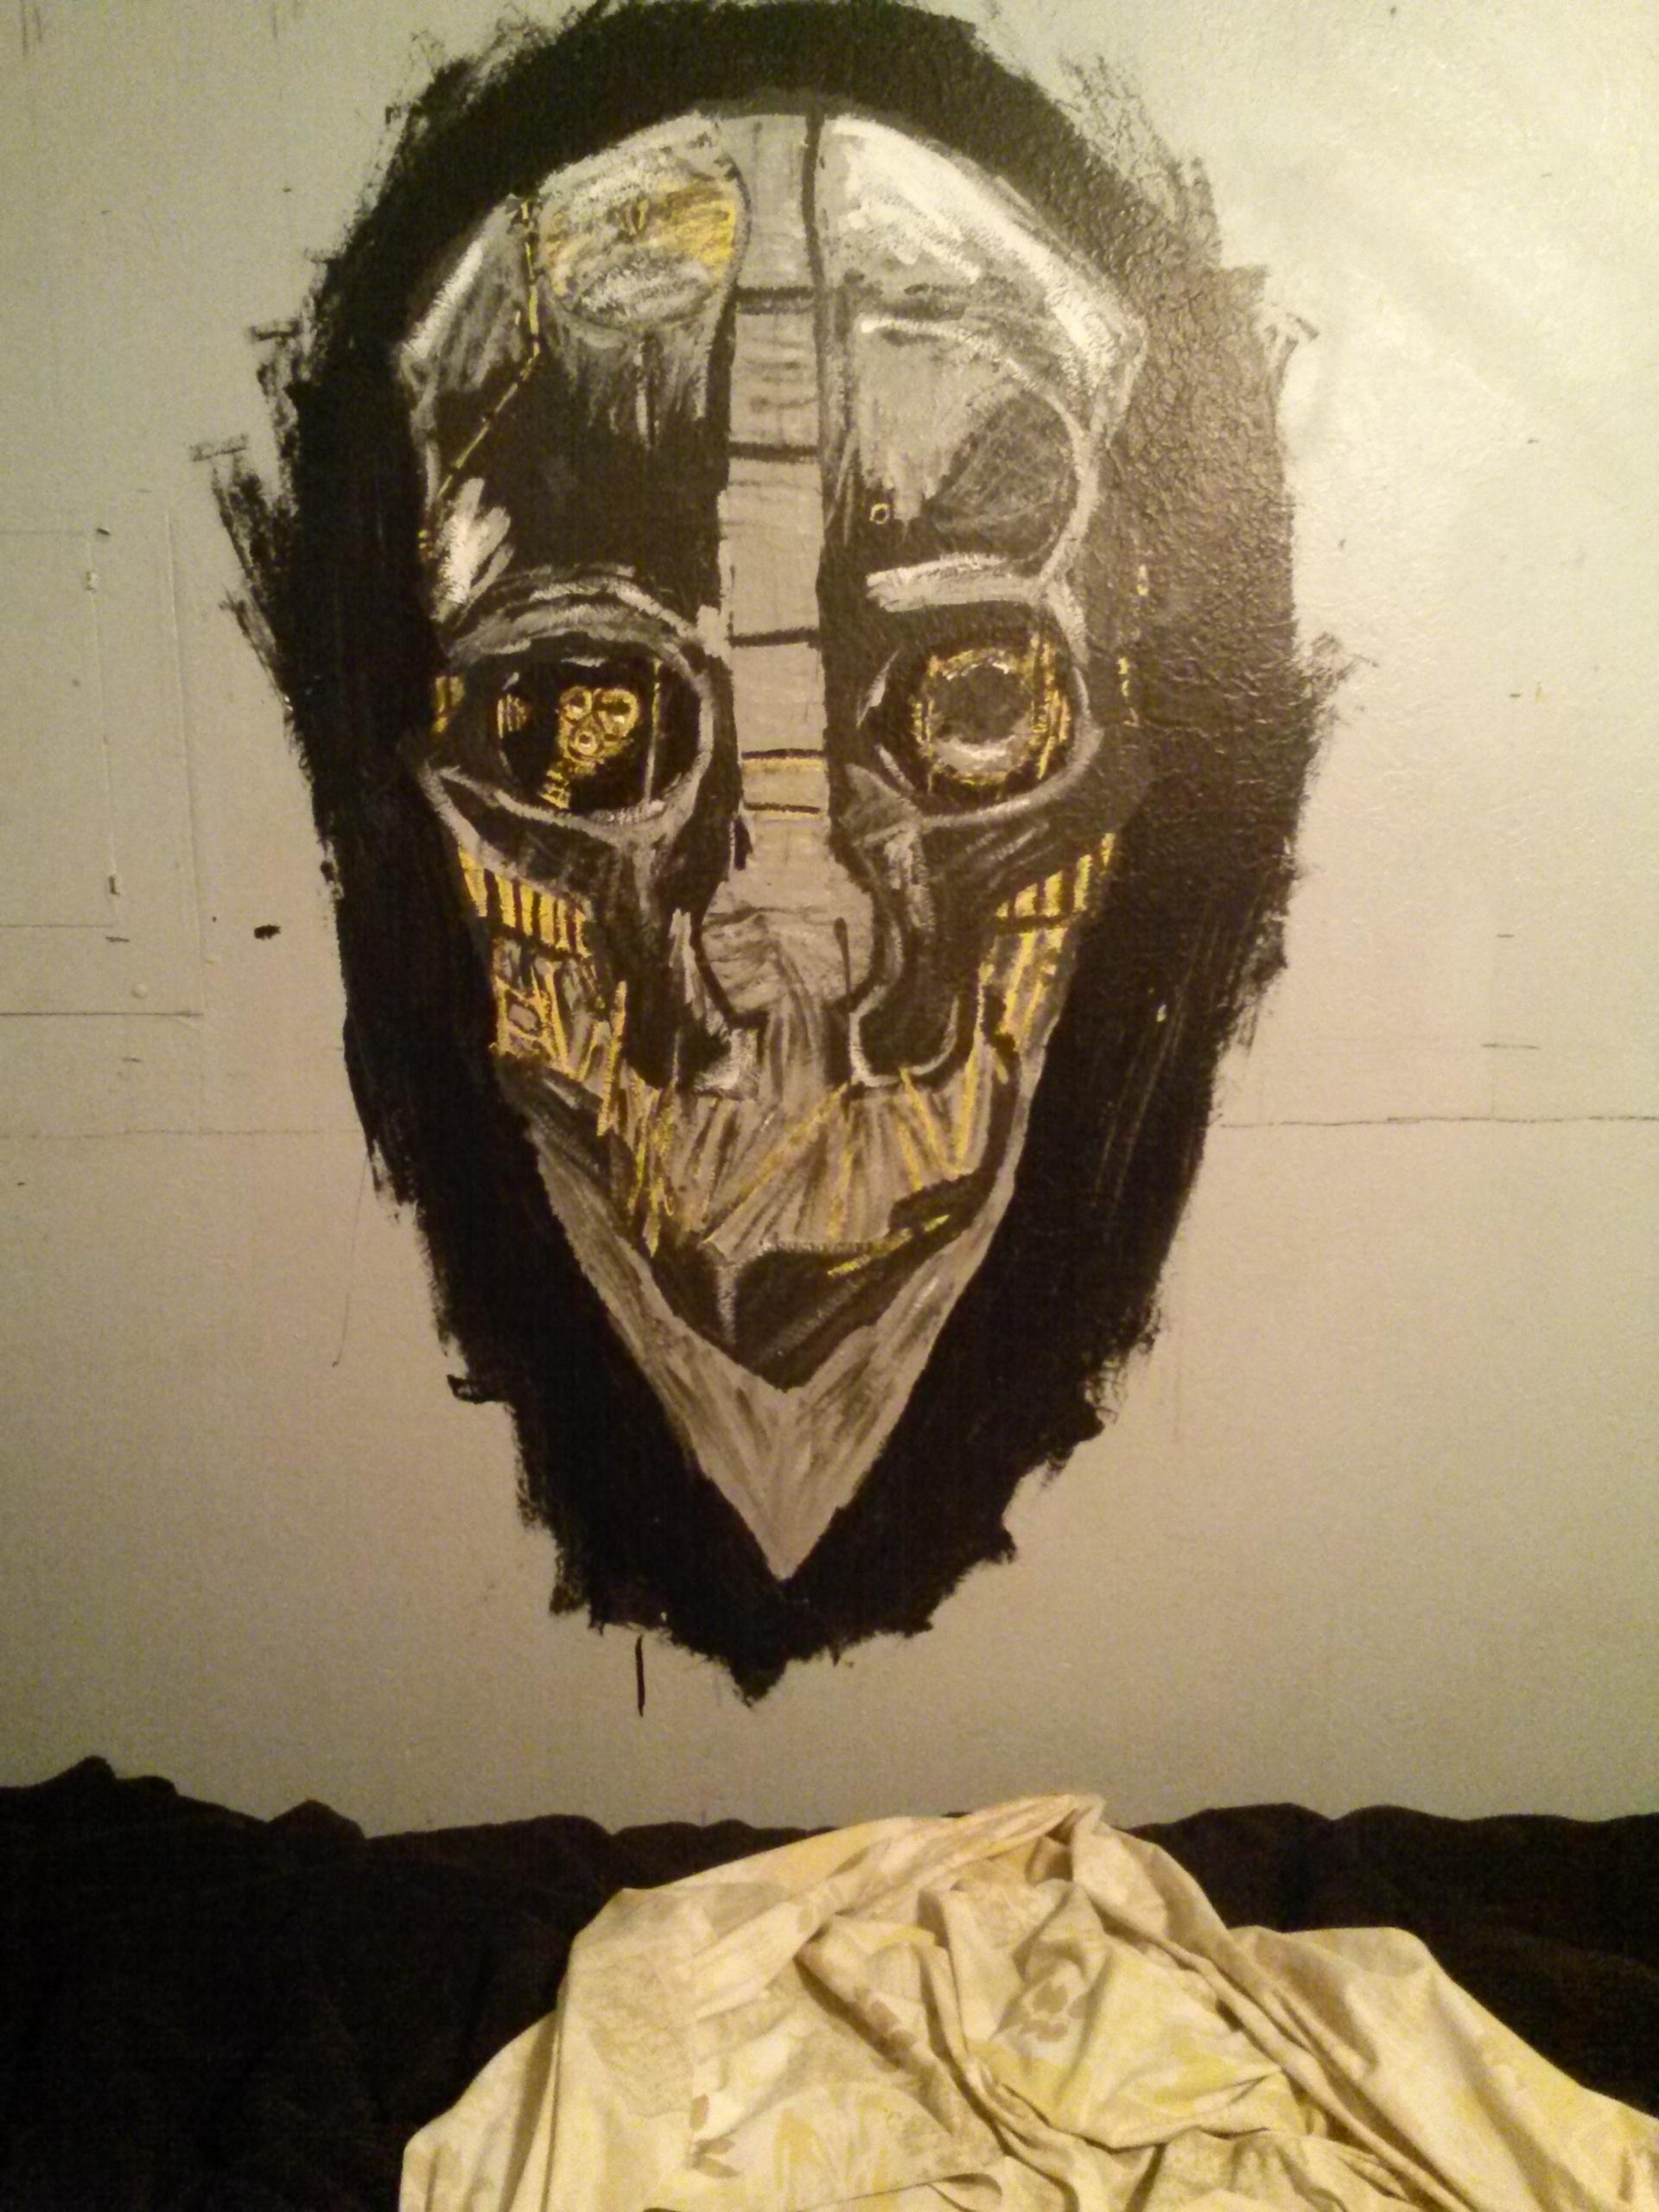 Dishonored wall art